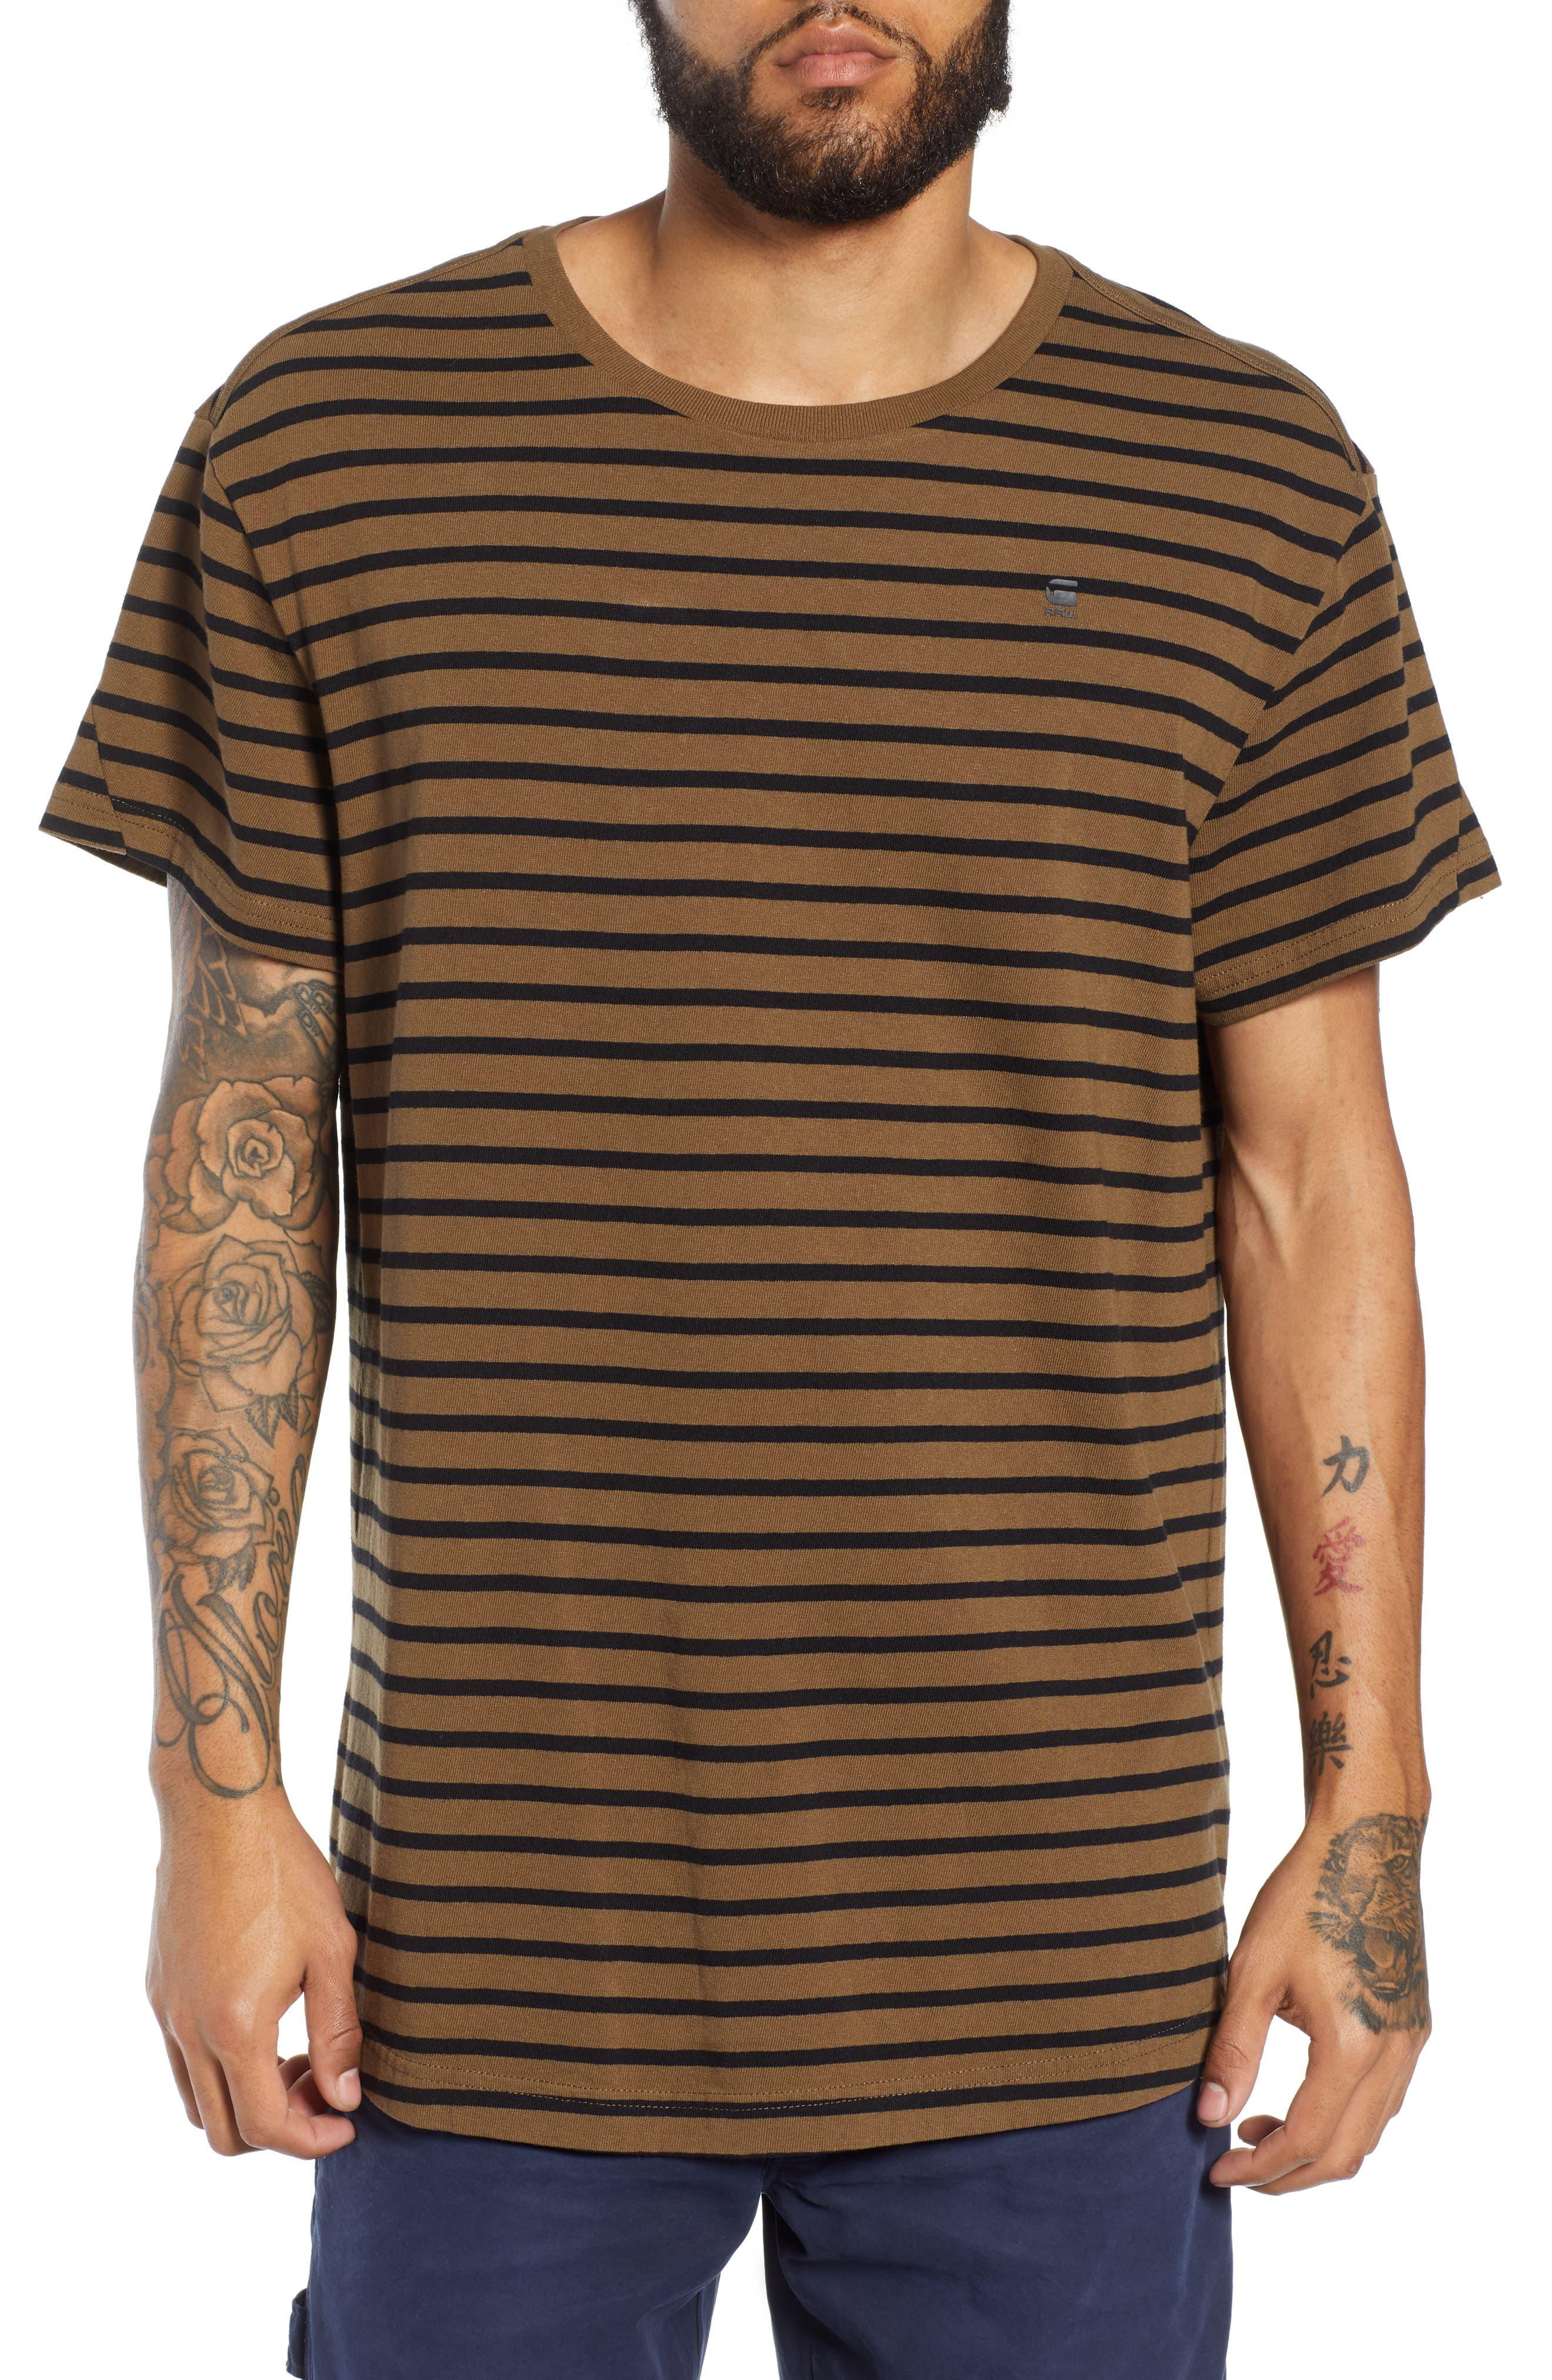 G-STAR RAW Starkon Stripe T-Shirt in Wild Olive/ Dark Black